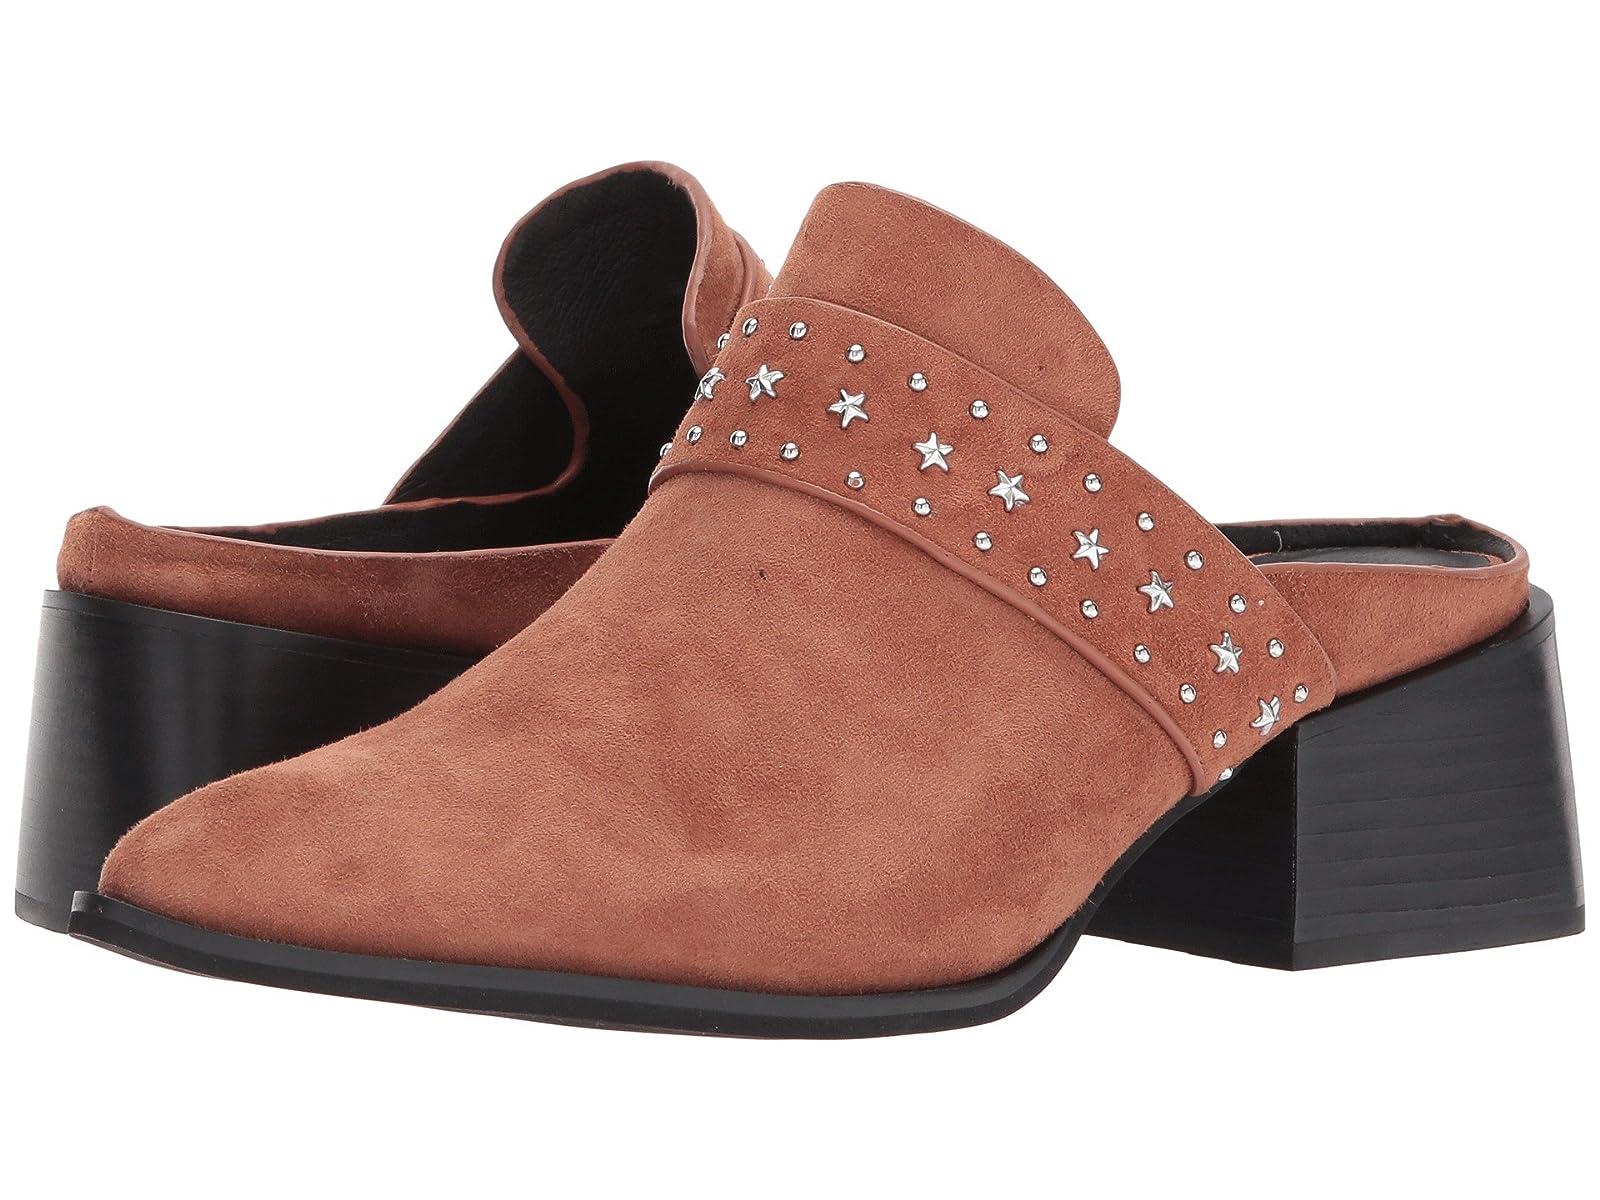 Sol Sana Charli MuleCheap and distinctive eye-catching shoes